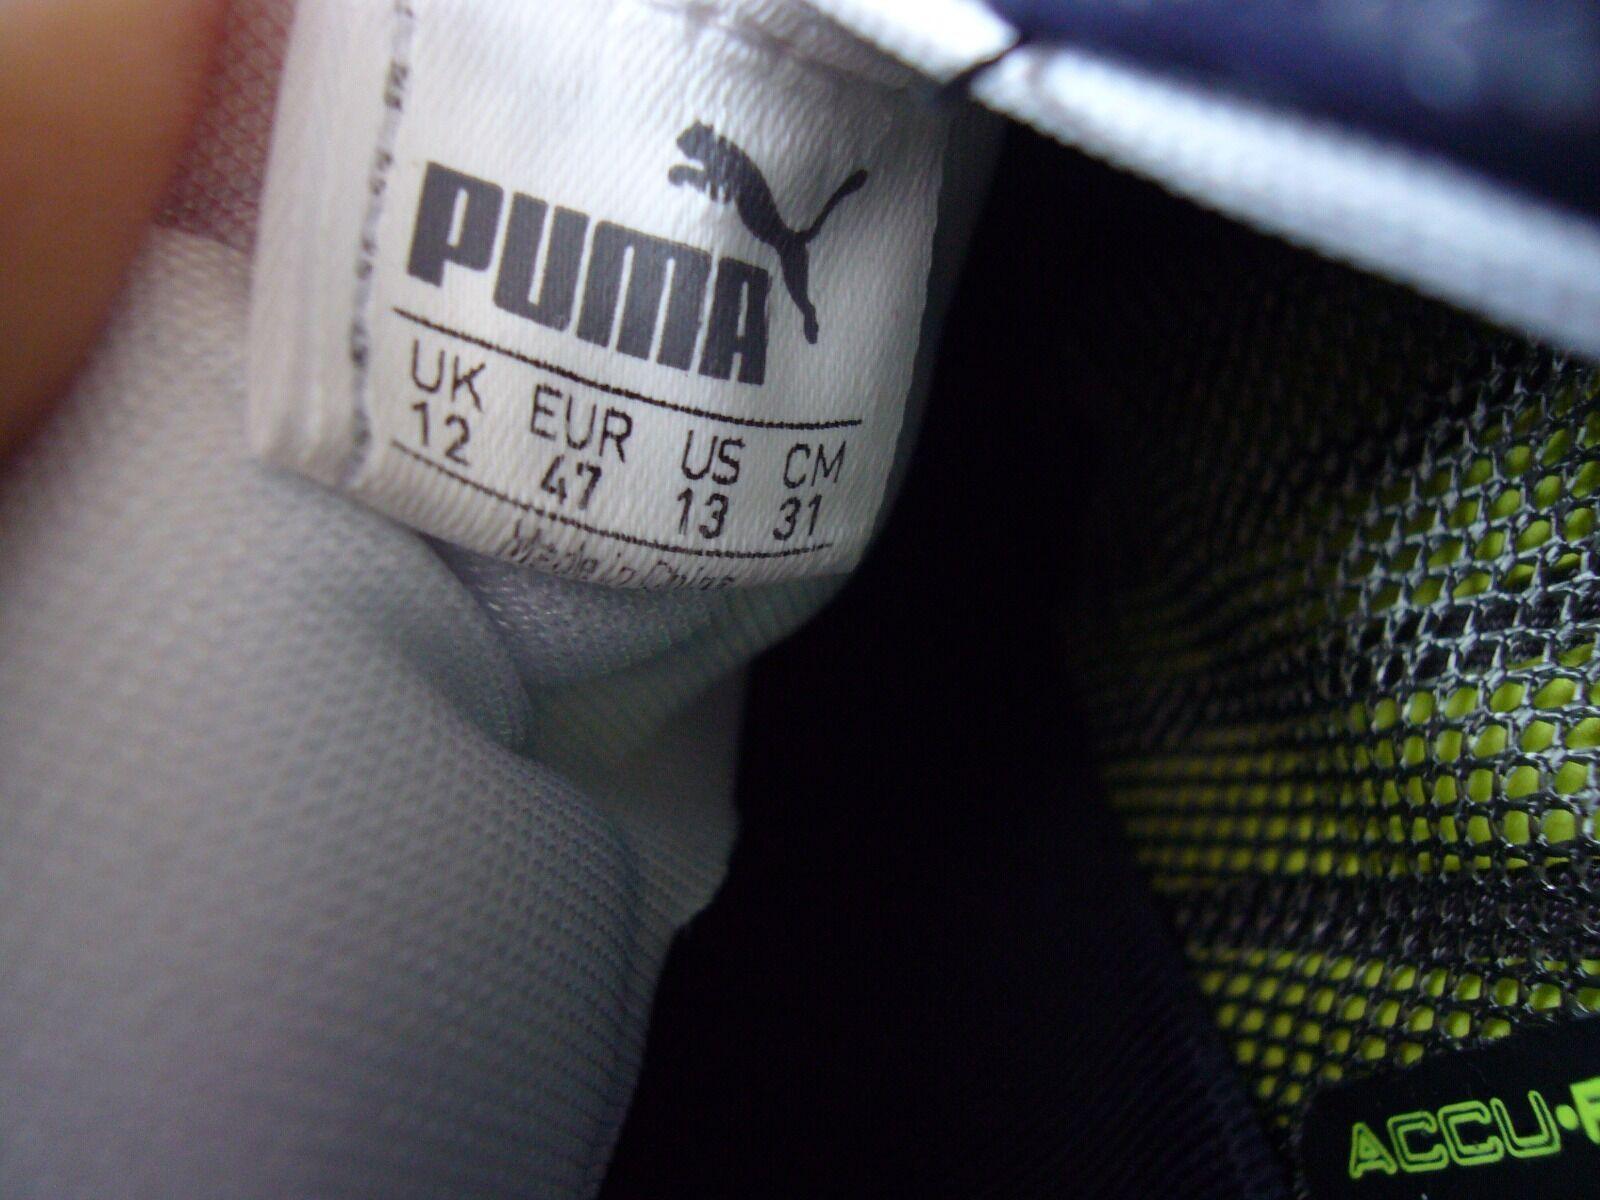 Puma Fußballschuhe evopower Fußballschuhe Puma gr. 47  42  44 206cfb